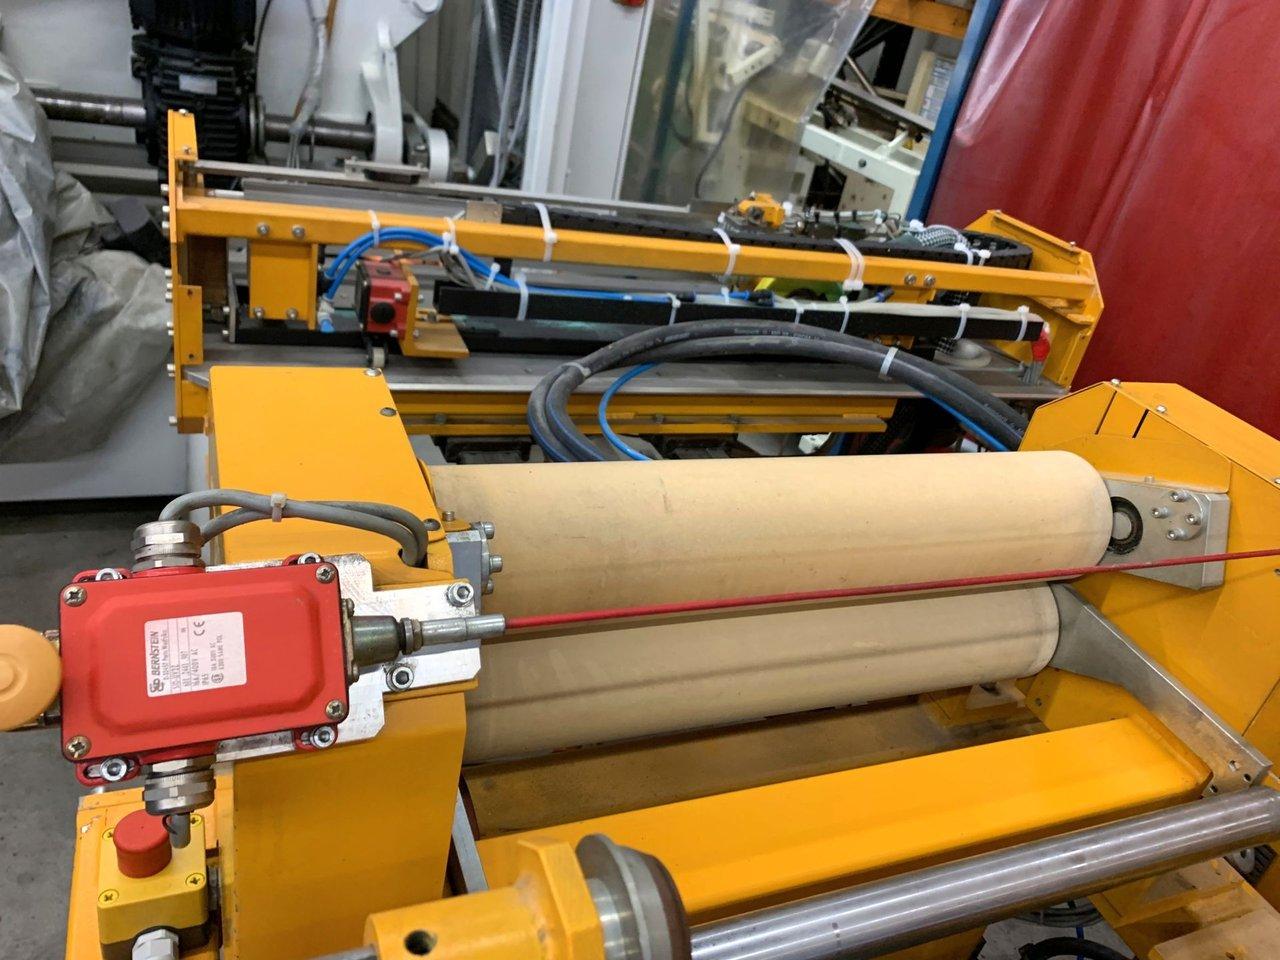 Laboratory Extrusion Line - Collin for Sale